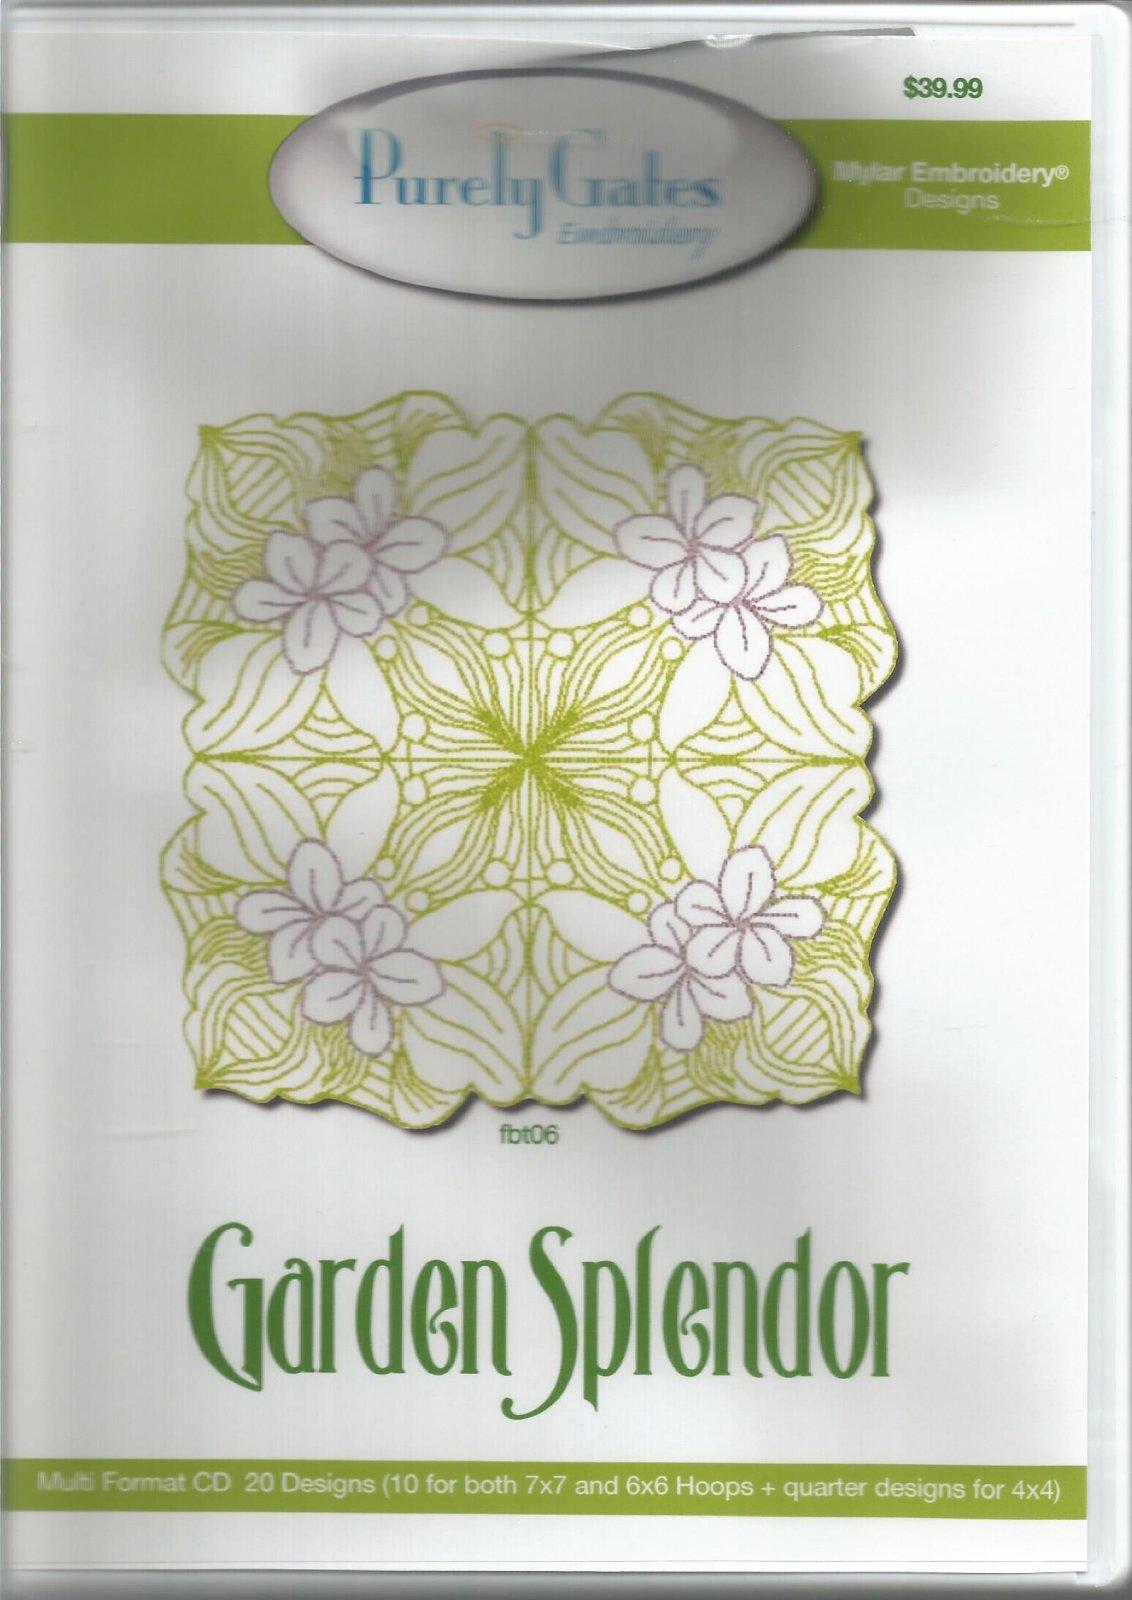 Purely Gates - Garden Splendor